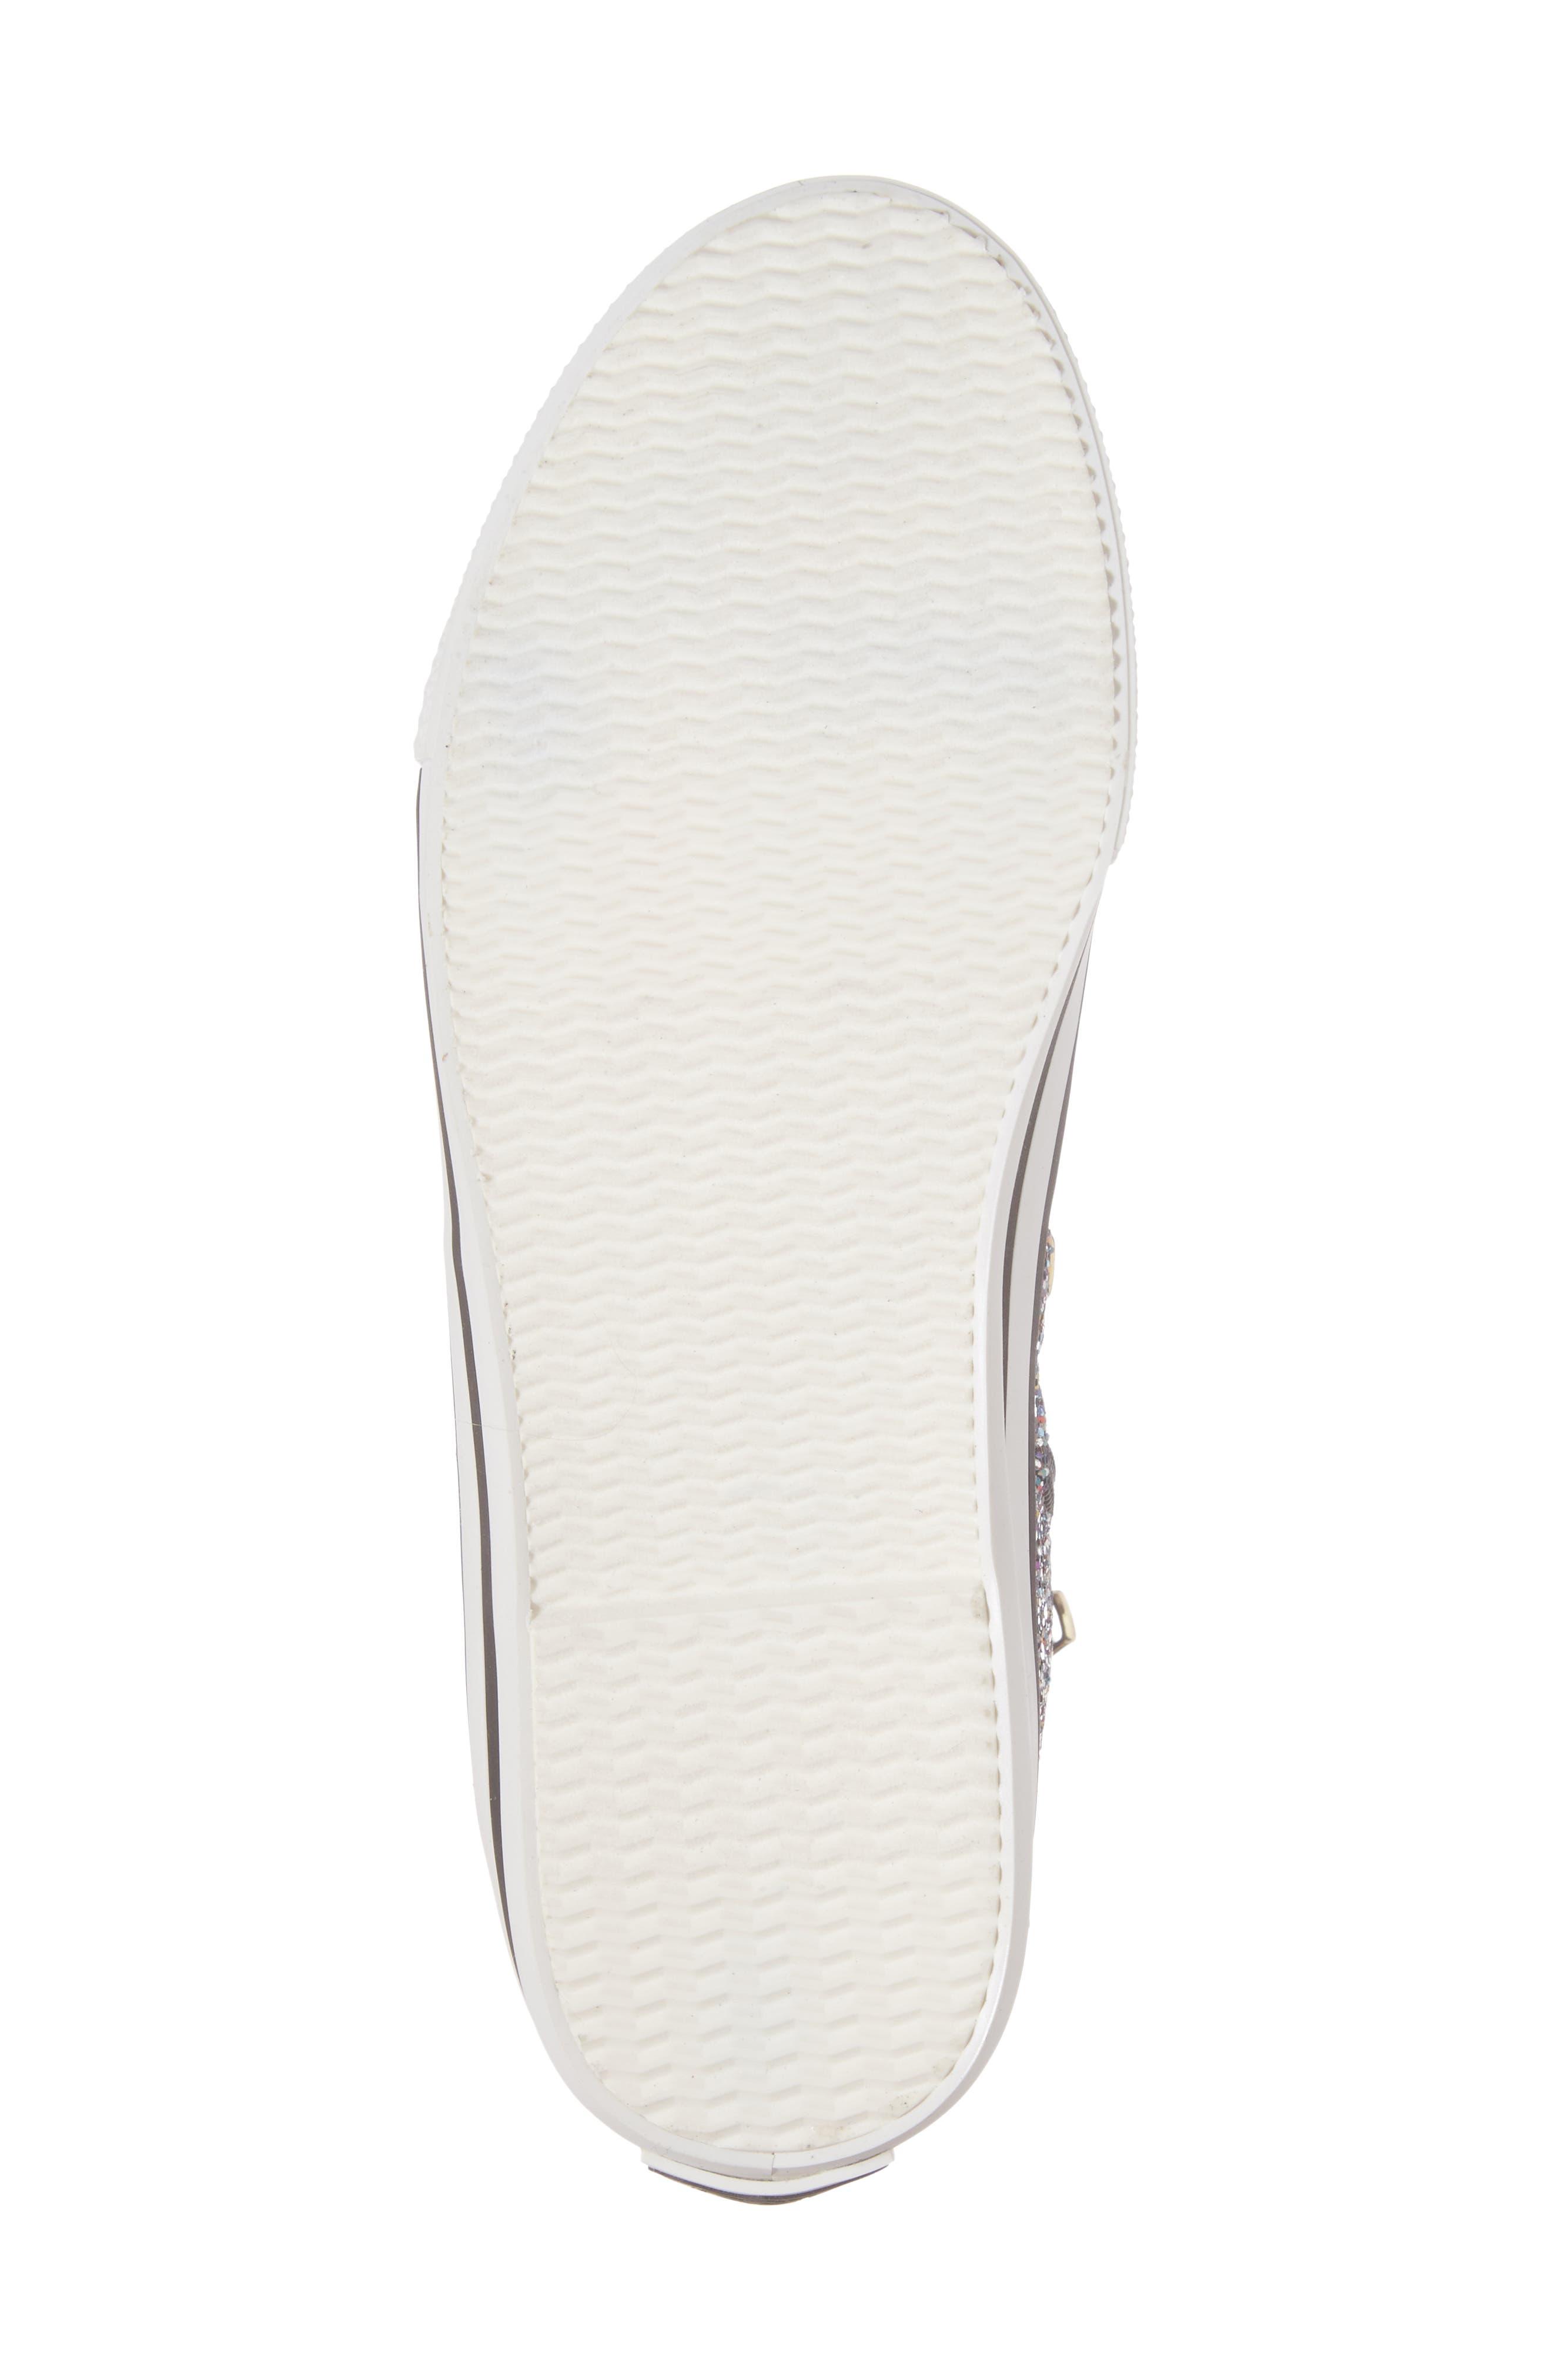 Lita Roe Glittery High Top Sneaker,                             Alternate thumbnail 6, color,                             003